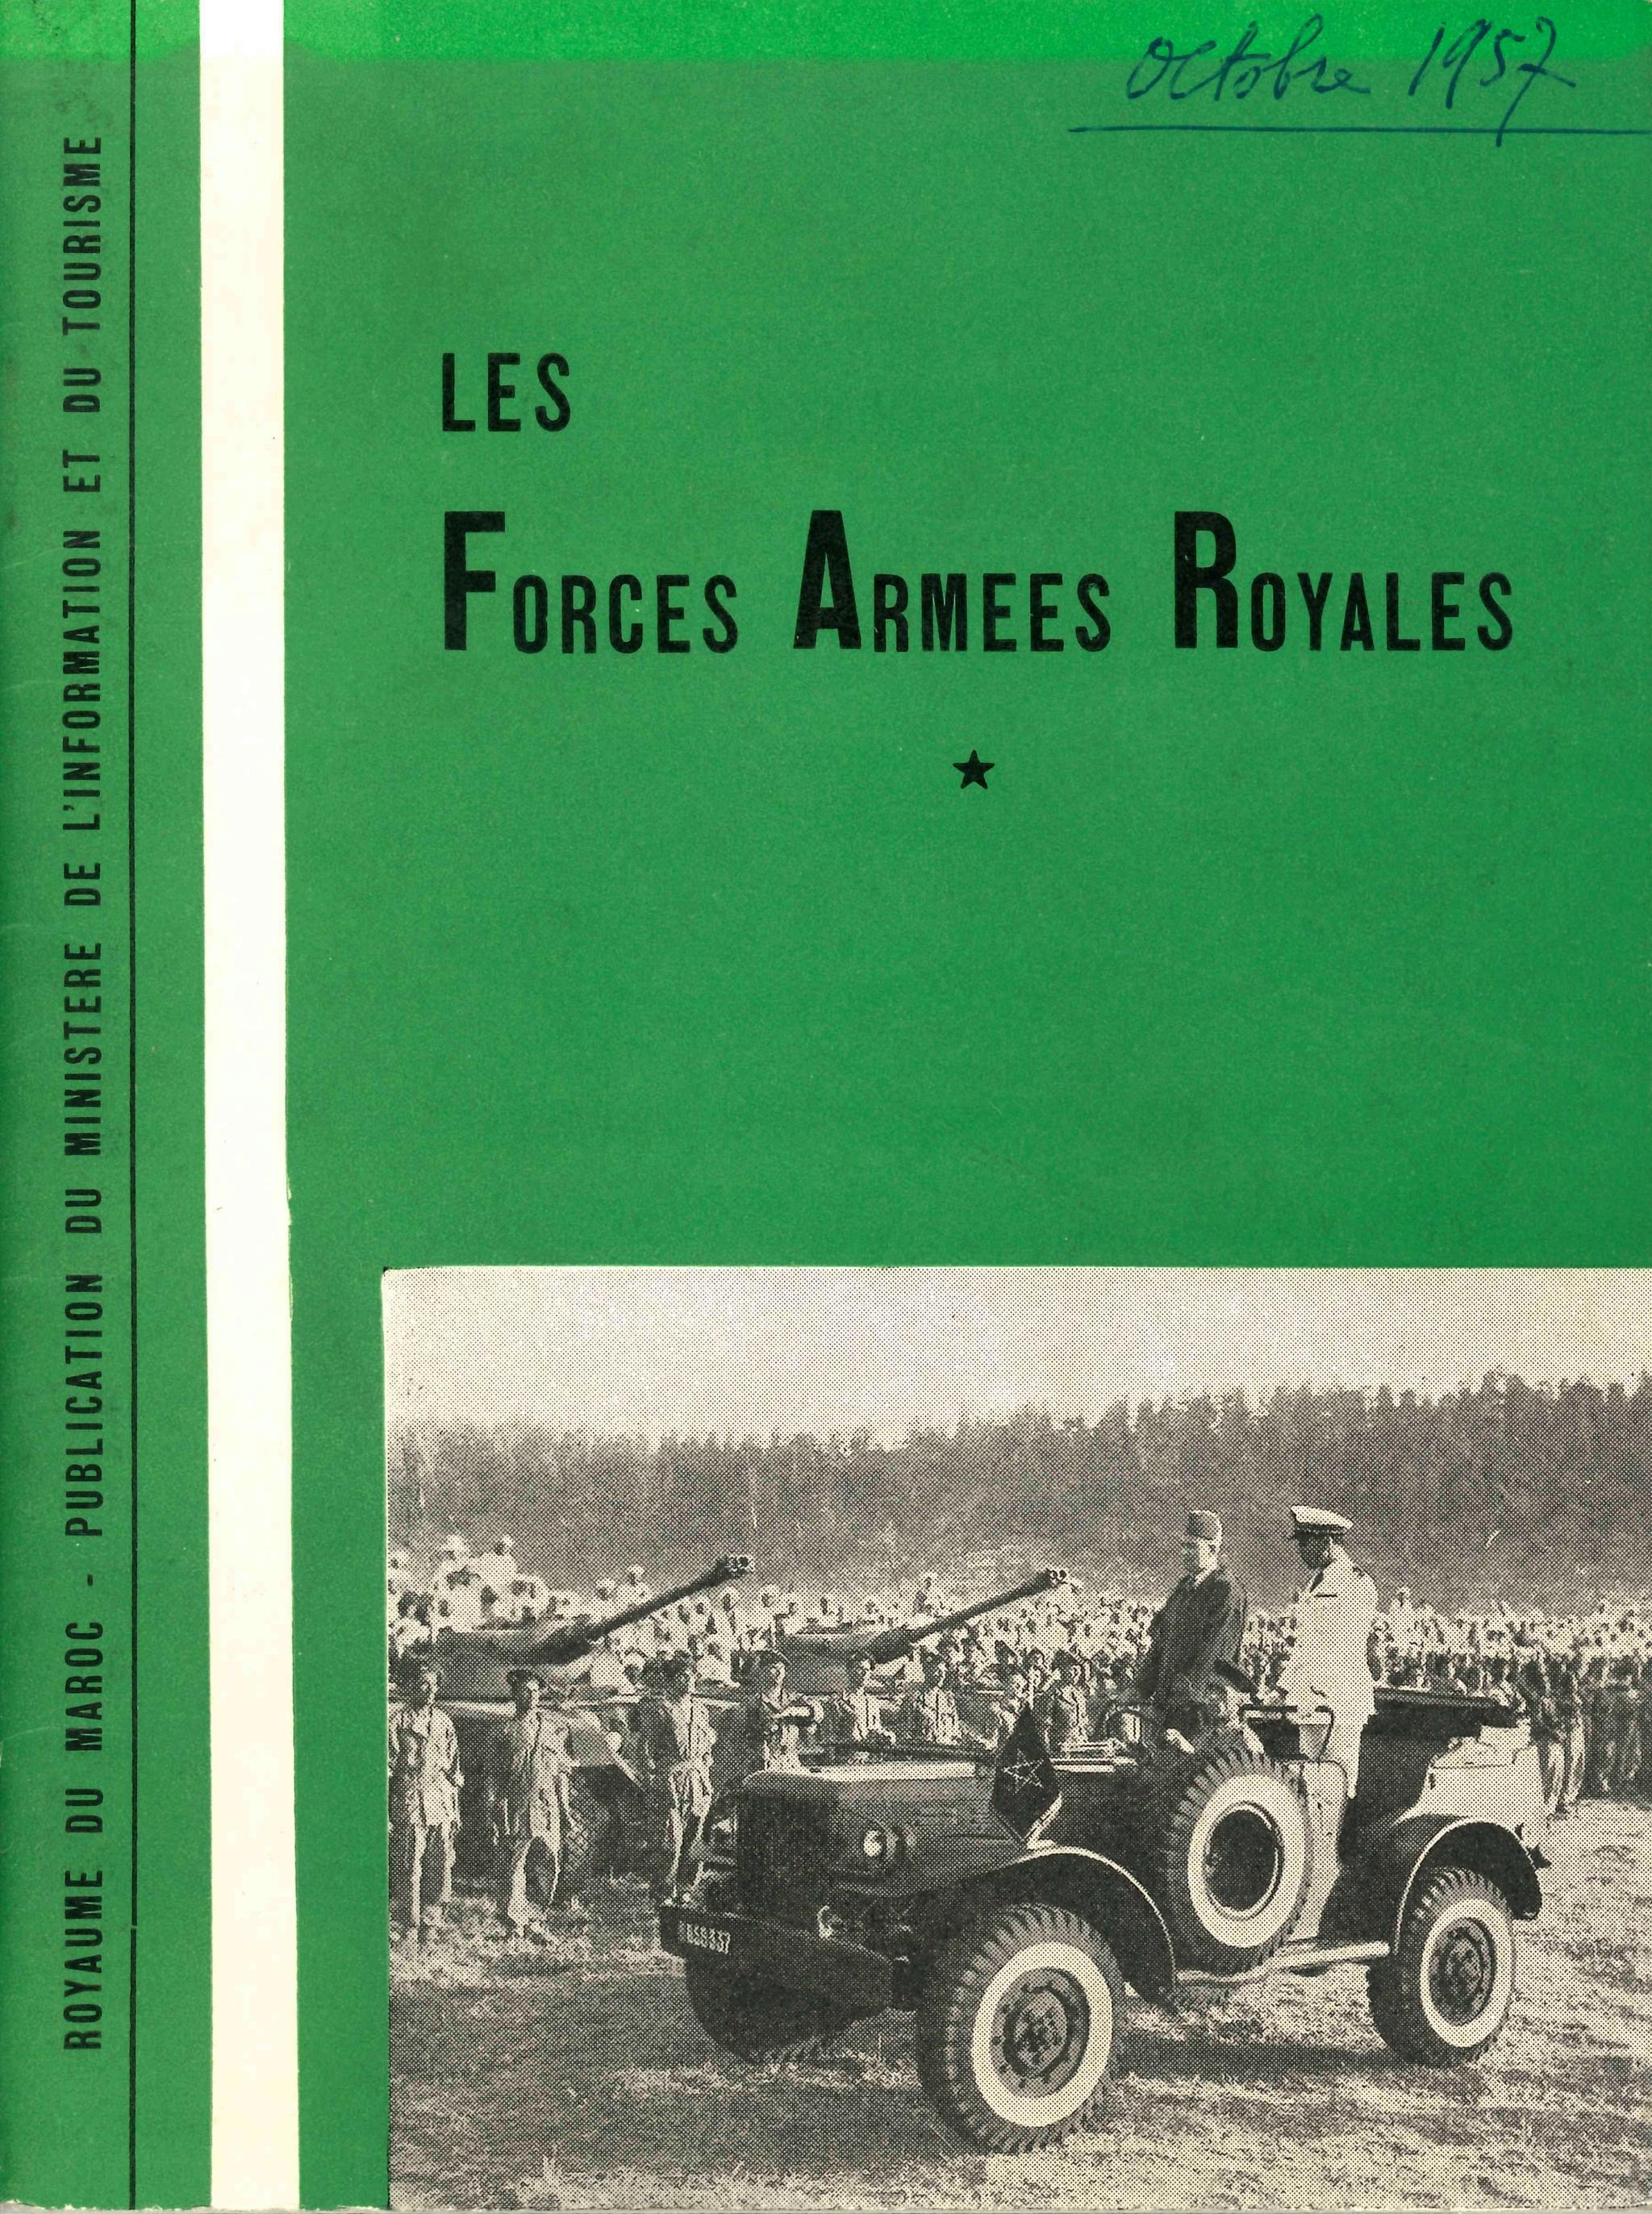 1957 - Les Forces Armées Royales  48642436361_e46ce6f9b8_o